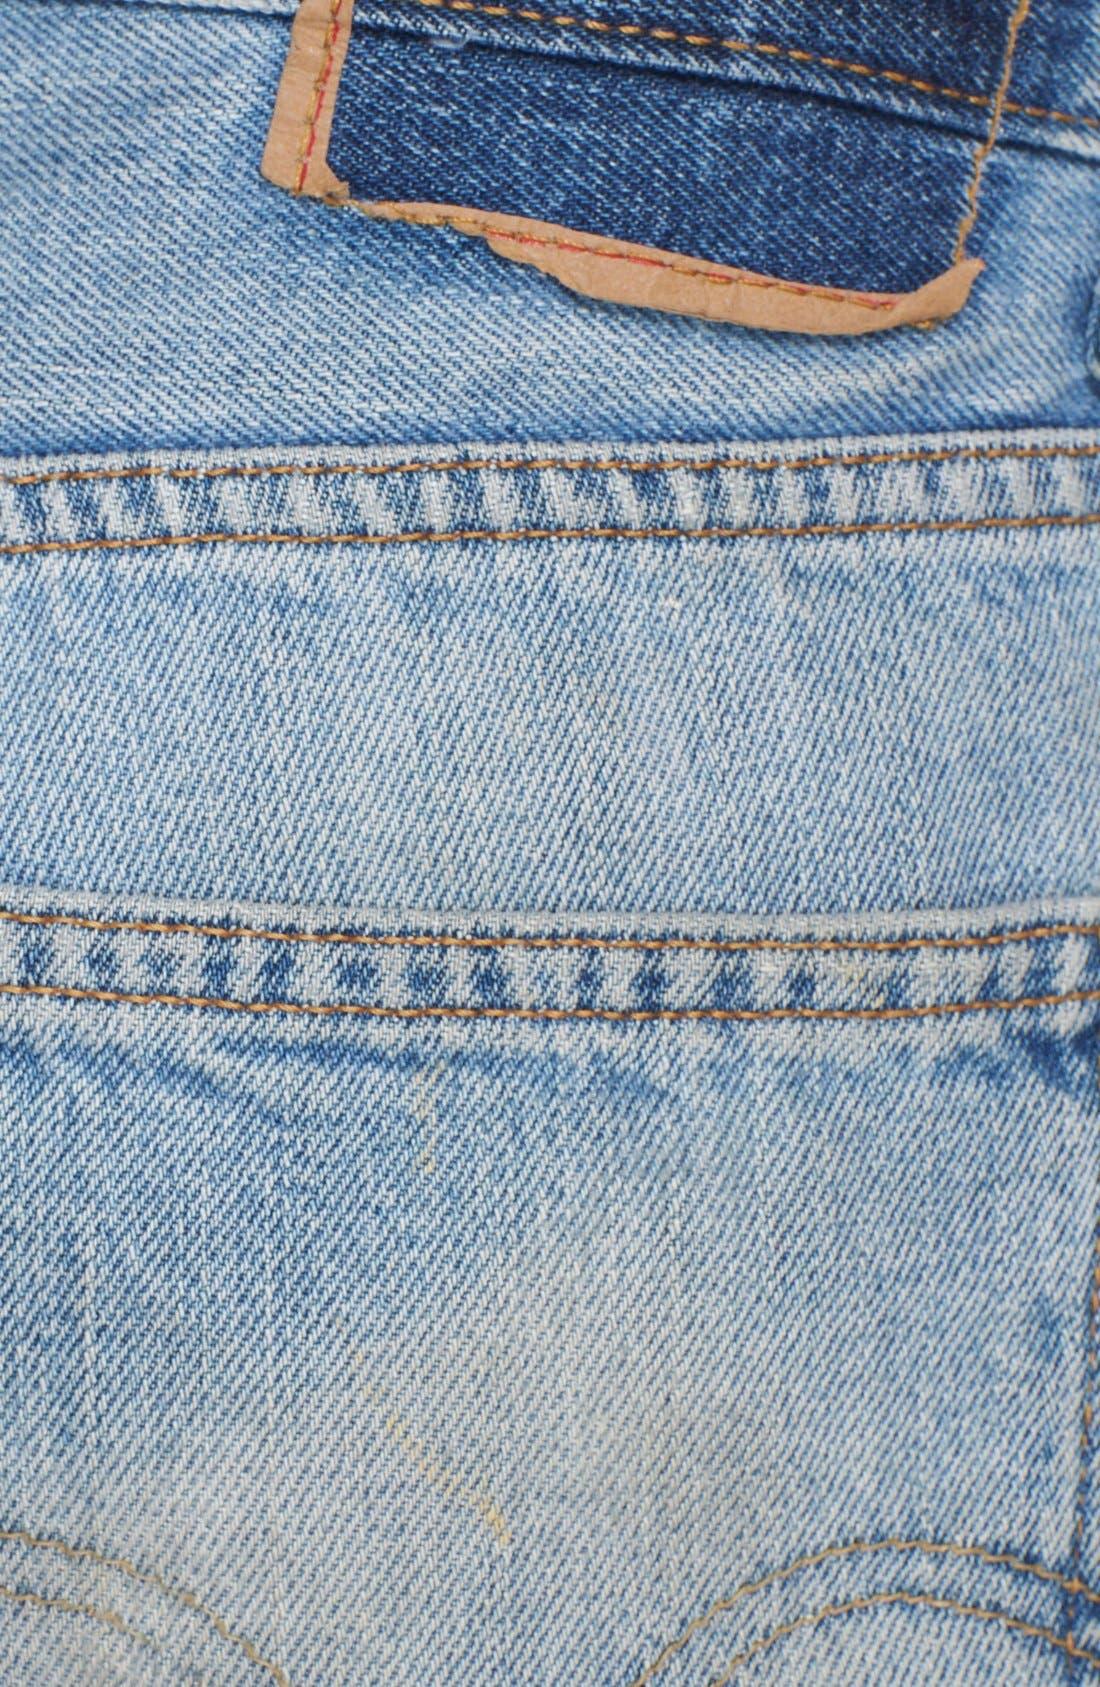 Alternate Image 3  - Free People Boyfriend Cutoff Denim Shorts